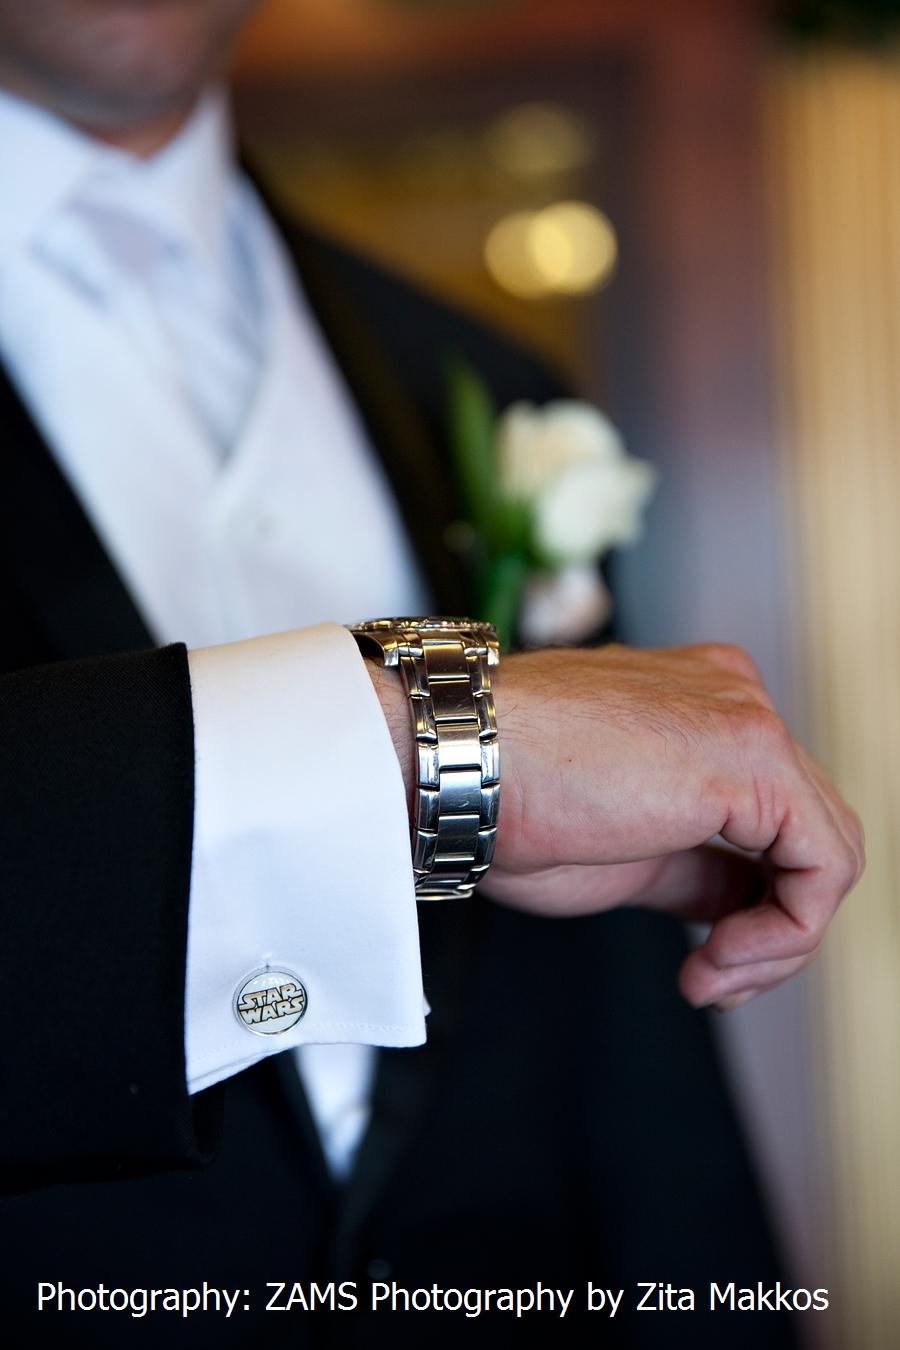 iron_man_superhero_cuff_links_men_wedding_groom_gifts_cufflinks_2.jpg